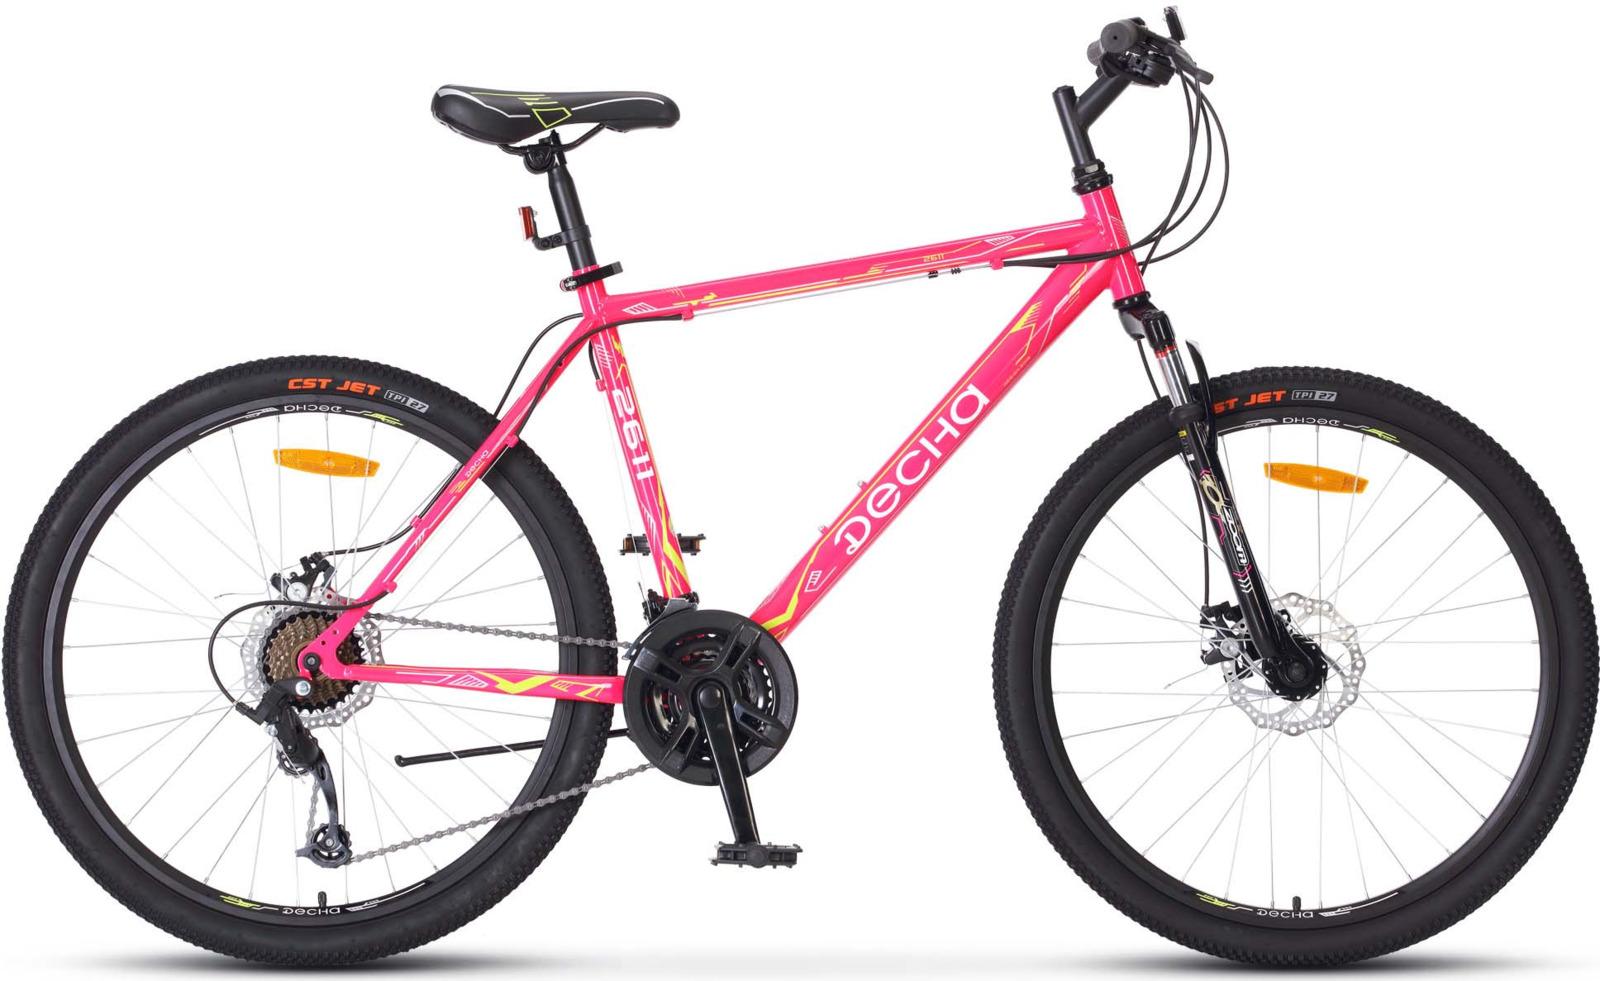 Велосипед Stels Десна-2611 MD 17, KUBC0047112018, розовый велосипед десна 2611 md 26 v010 17 жёлтый